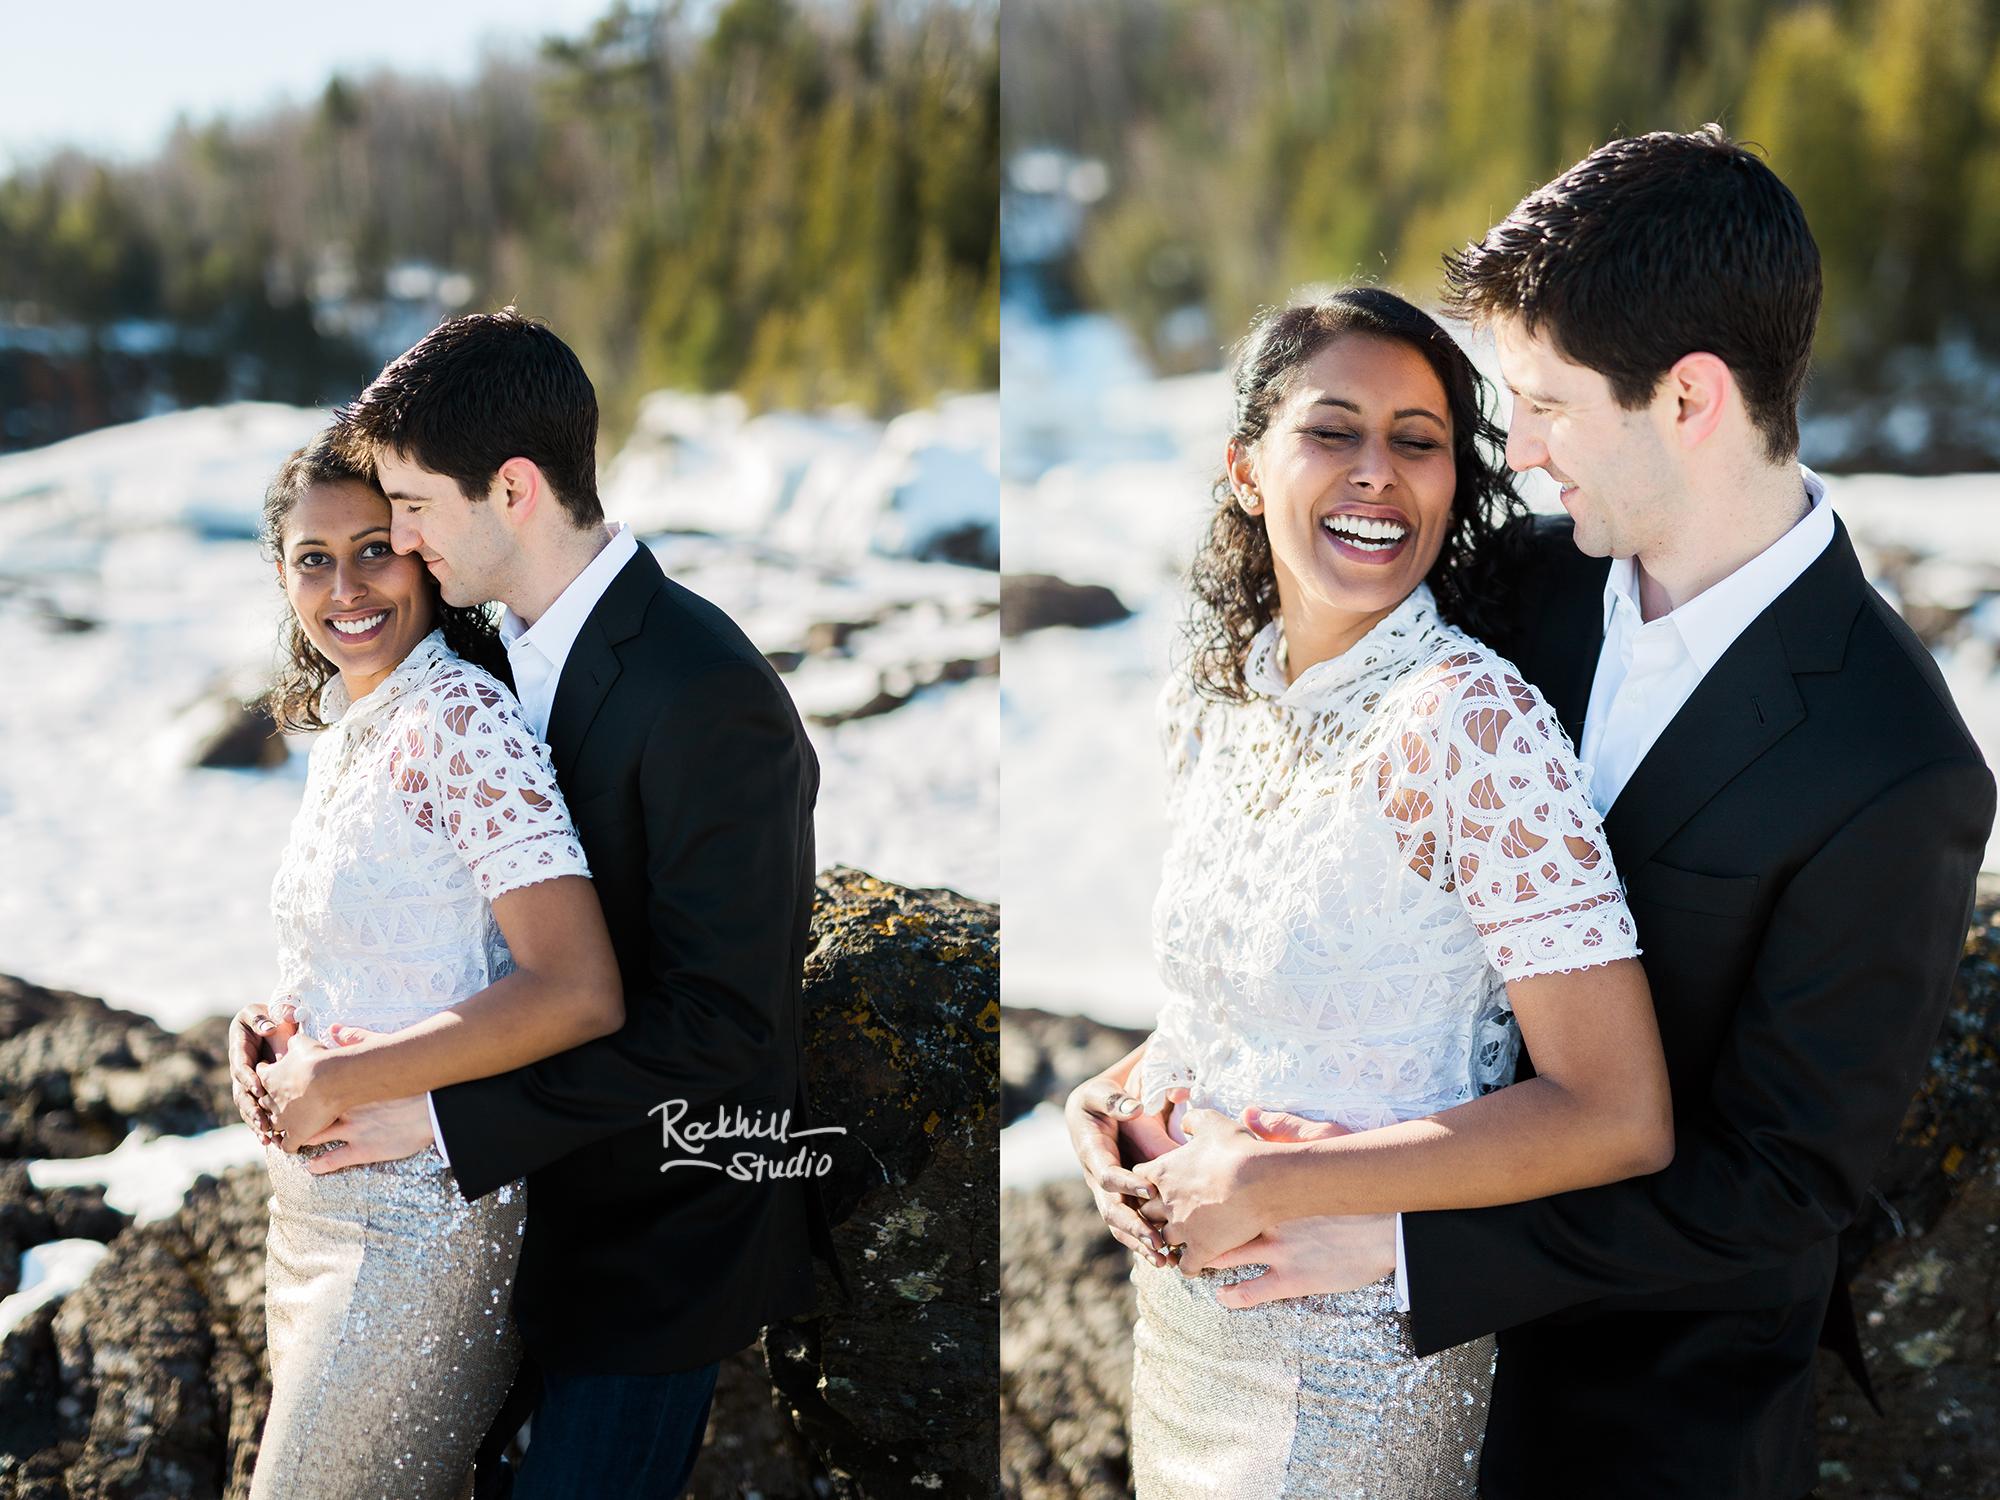 northern-michigan-wedding-marquette-engagement-upper-peninsula-michigan-rockhill-winter-6.jpg